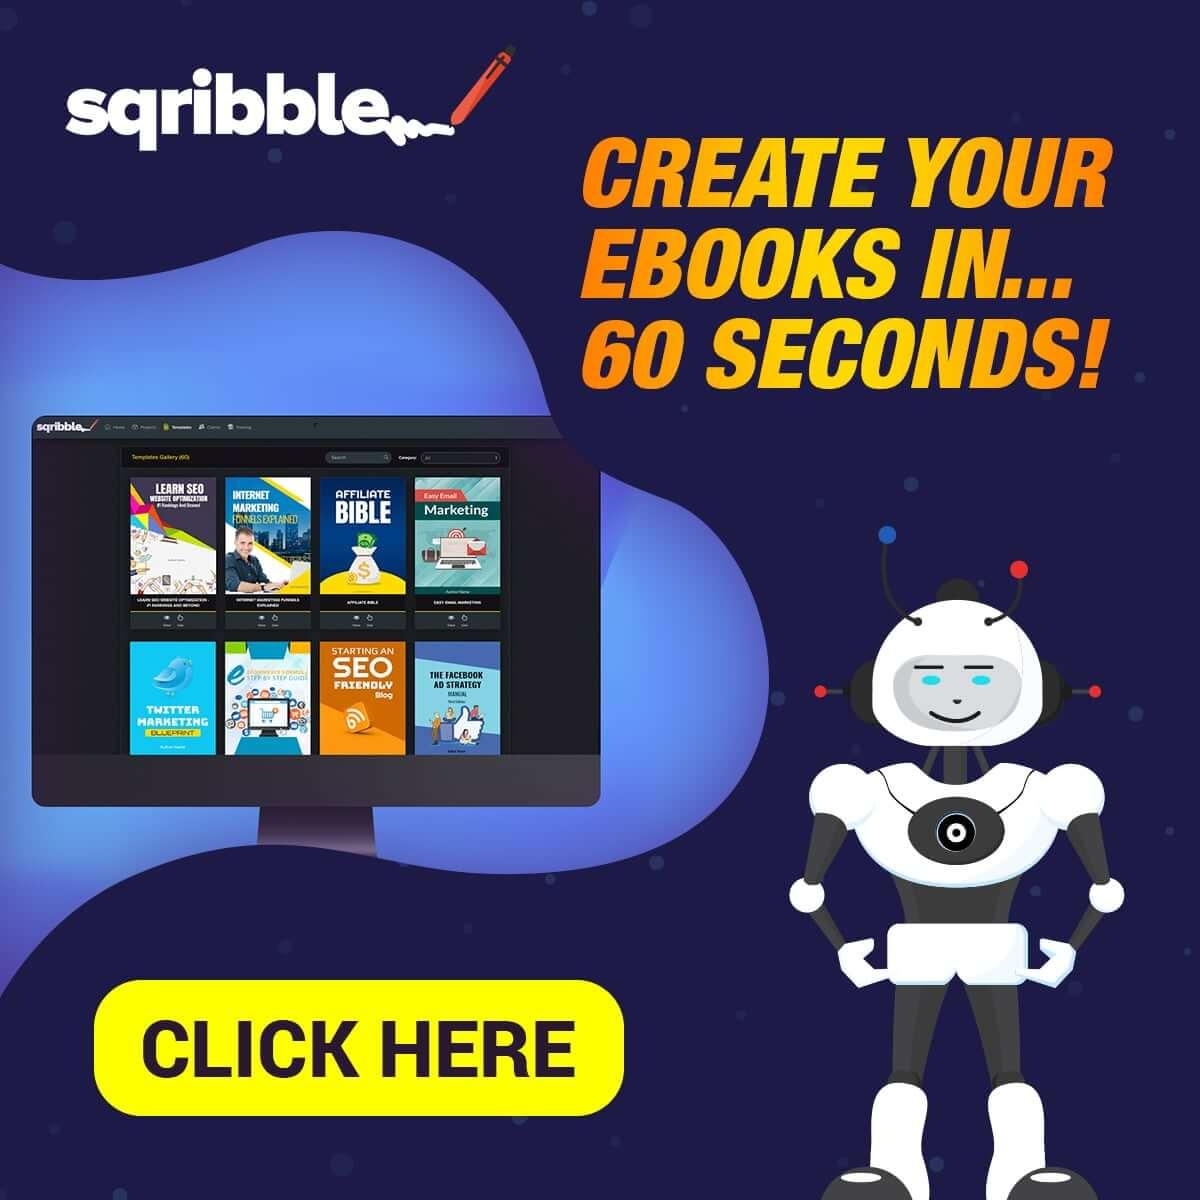 sqribble, sqribble review, sqribble ebook, sqribble ebook creator, sqribble ebook creator review, sqribble review 2020, sqribble affiliate program, sqribble pricing, scribble ebook creator, sqribble software, sqribble upsells, sqribble ebook software, sqribble affiliate, sqribble honest review, sqribble pros and cons, sqribble commercial, sqribble pro, sqribble scam, digital debashree dutta,